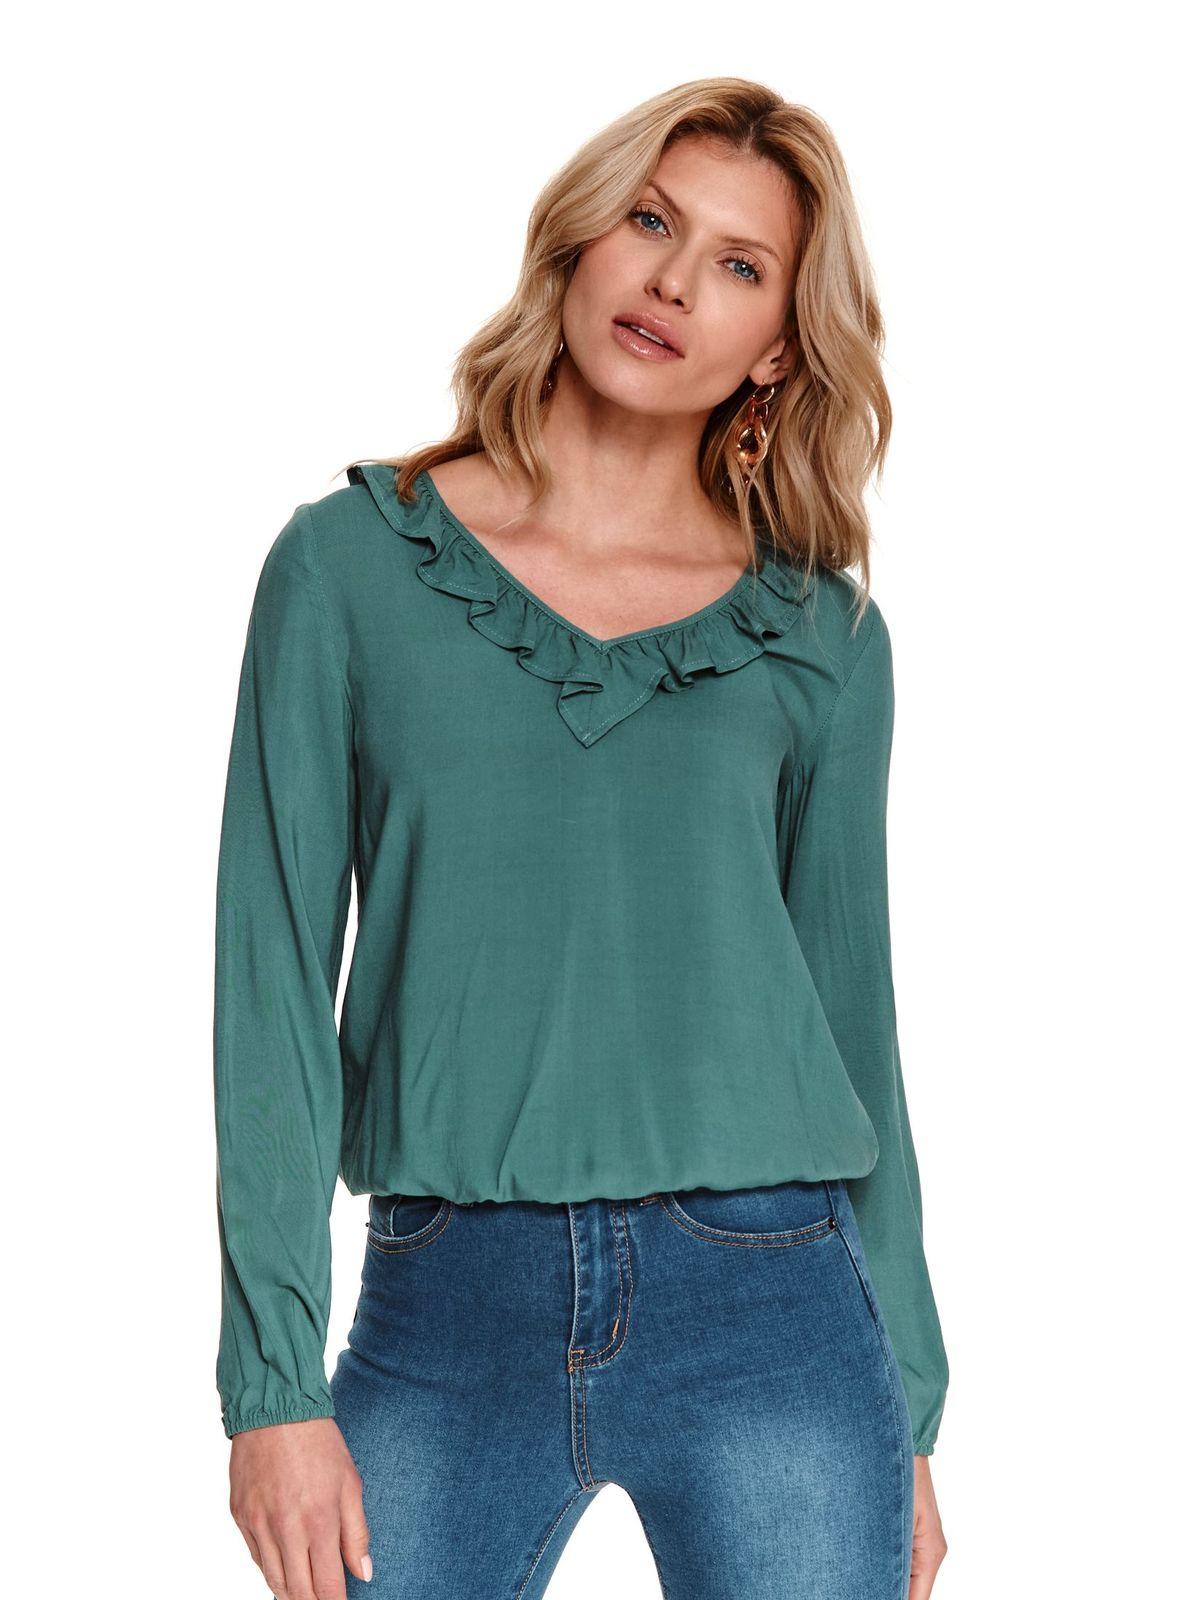 Bluza dama Top Secret verde-inchis cu volanase cu croi larg si elastic in talie